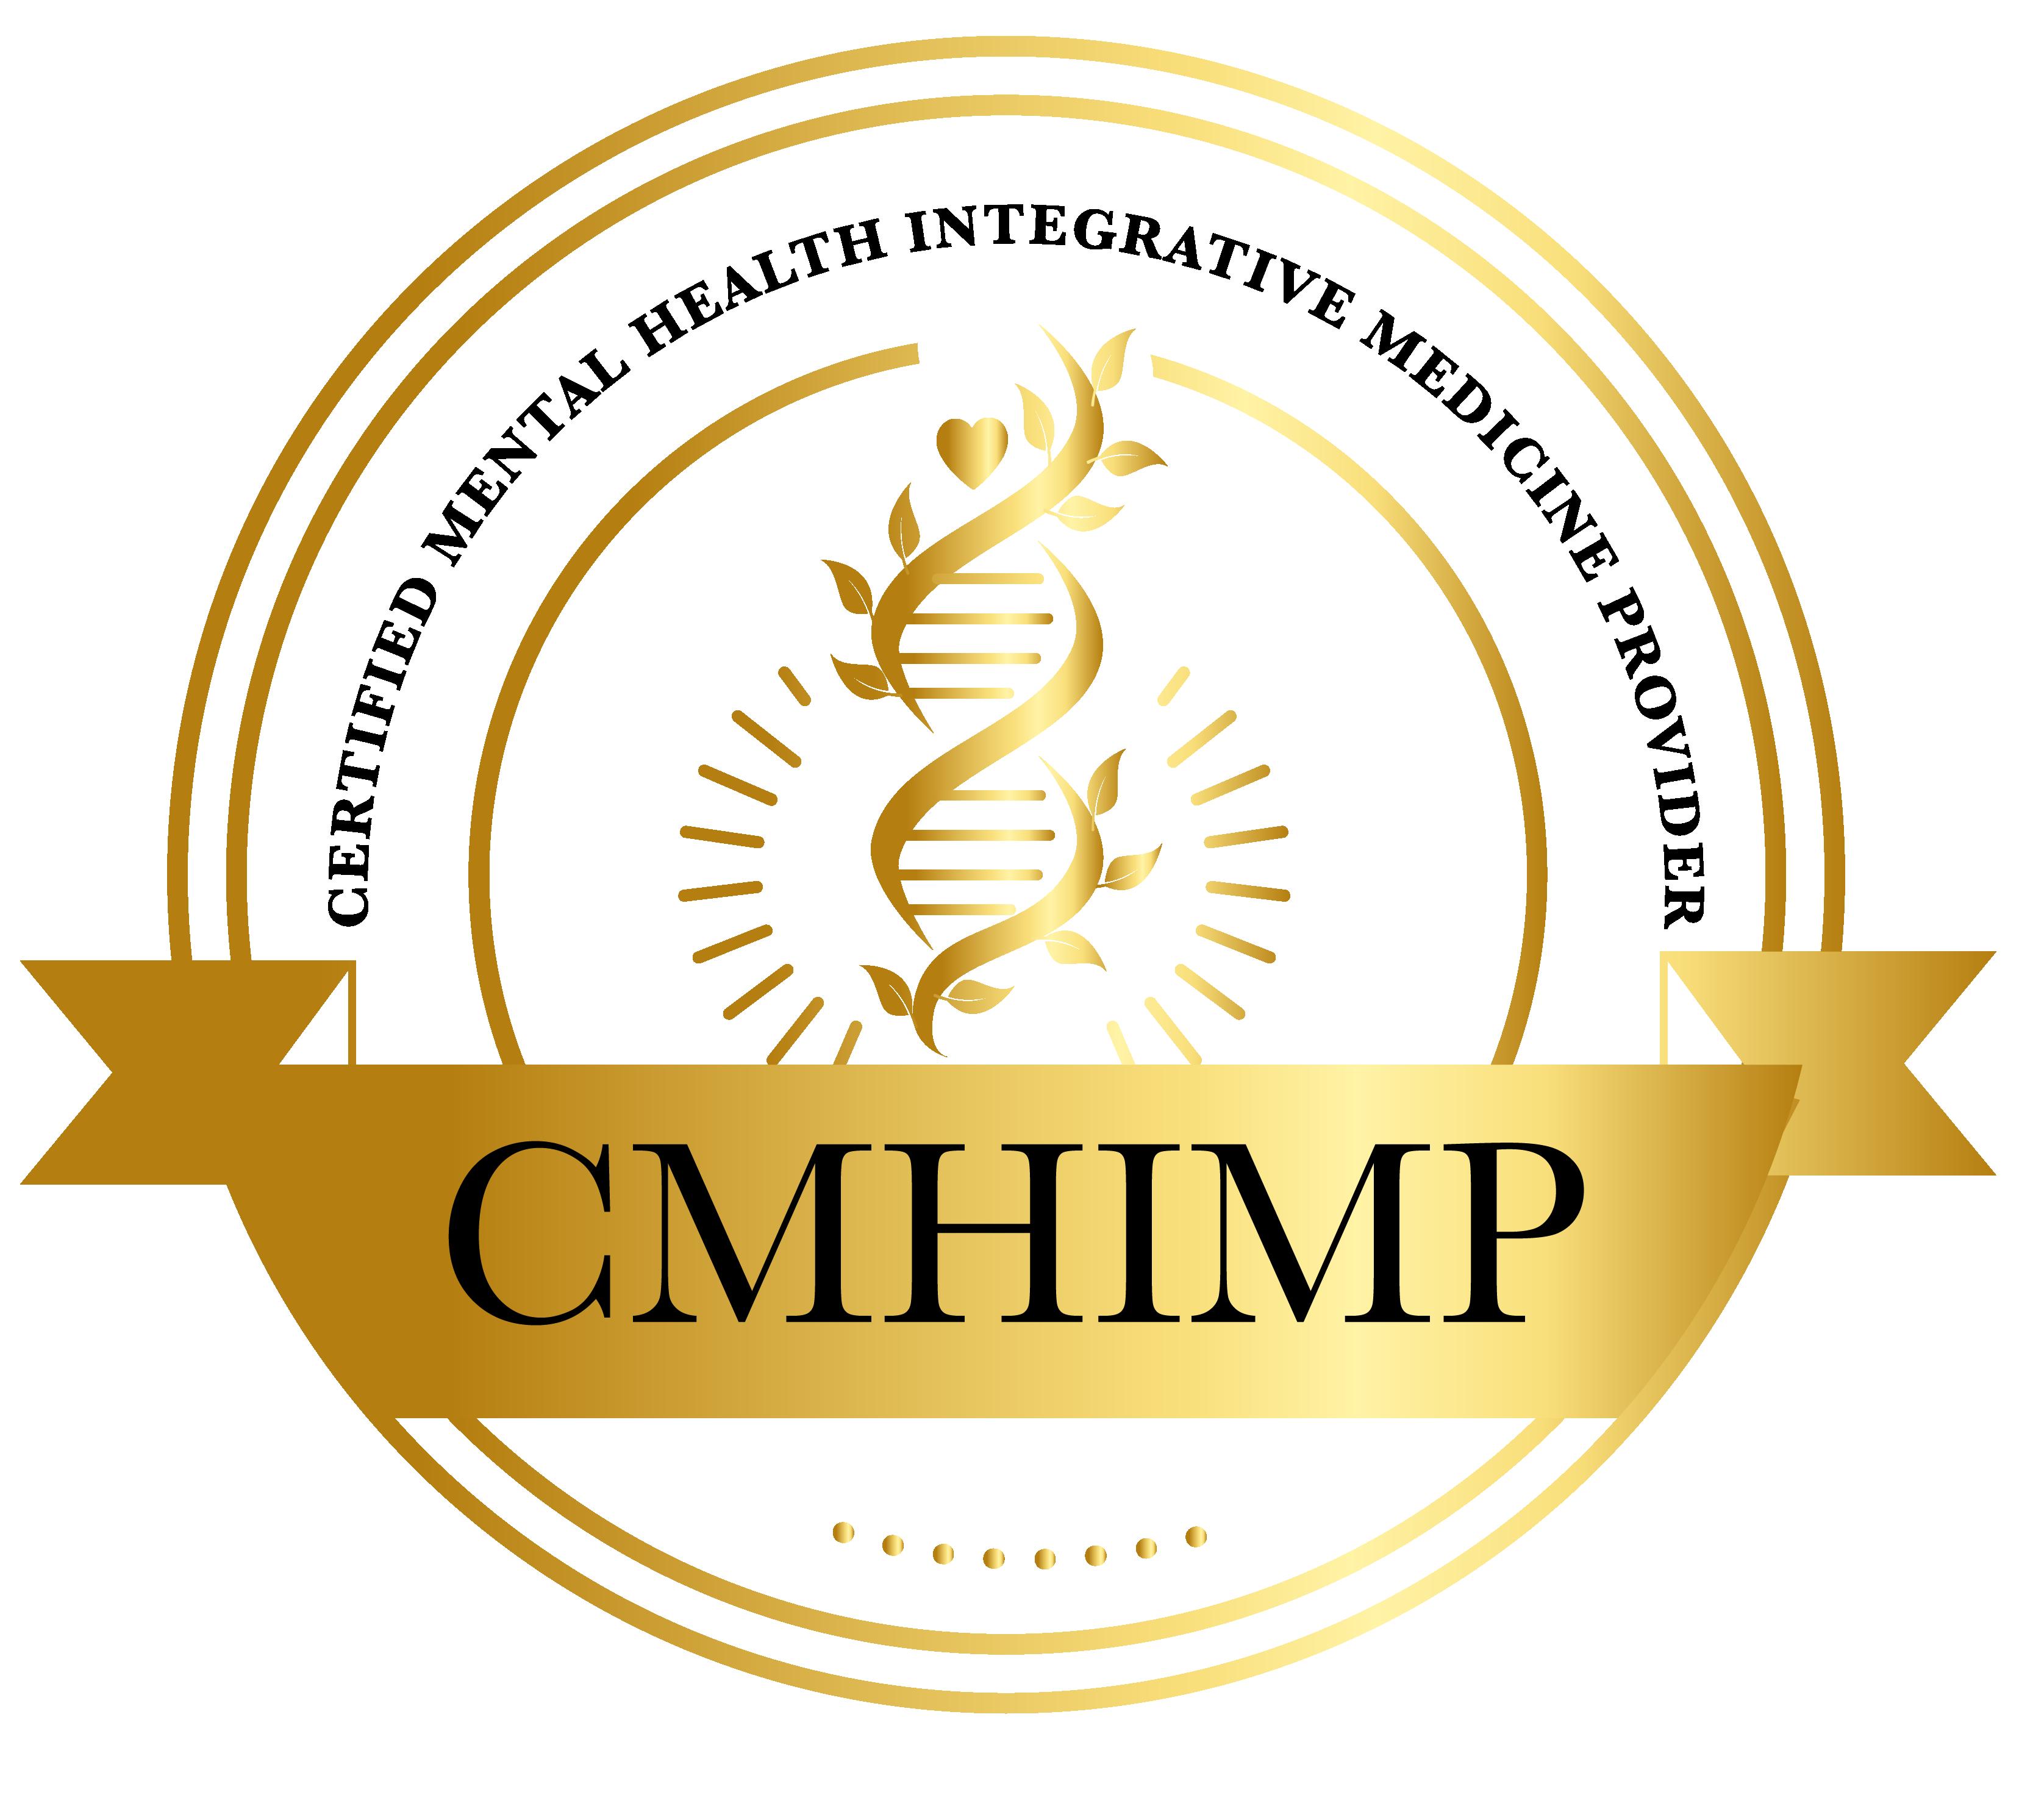 Certified Mental Health Integrative Medicine Provider